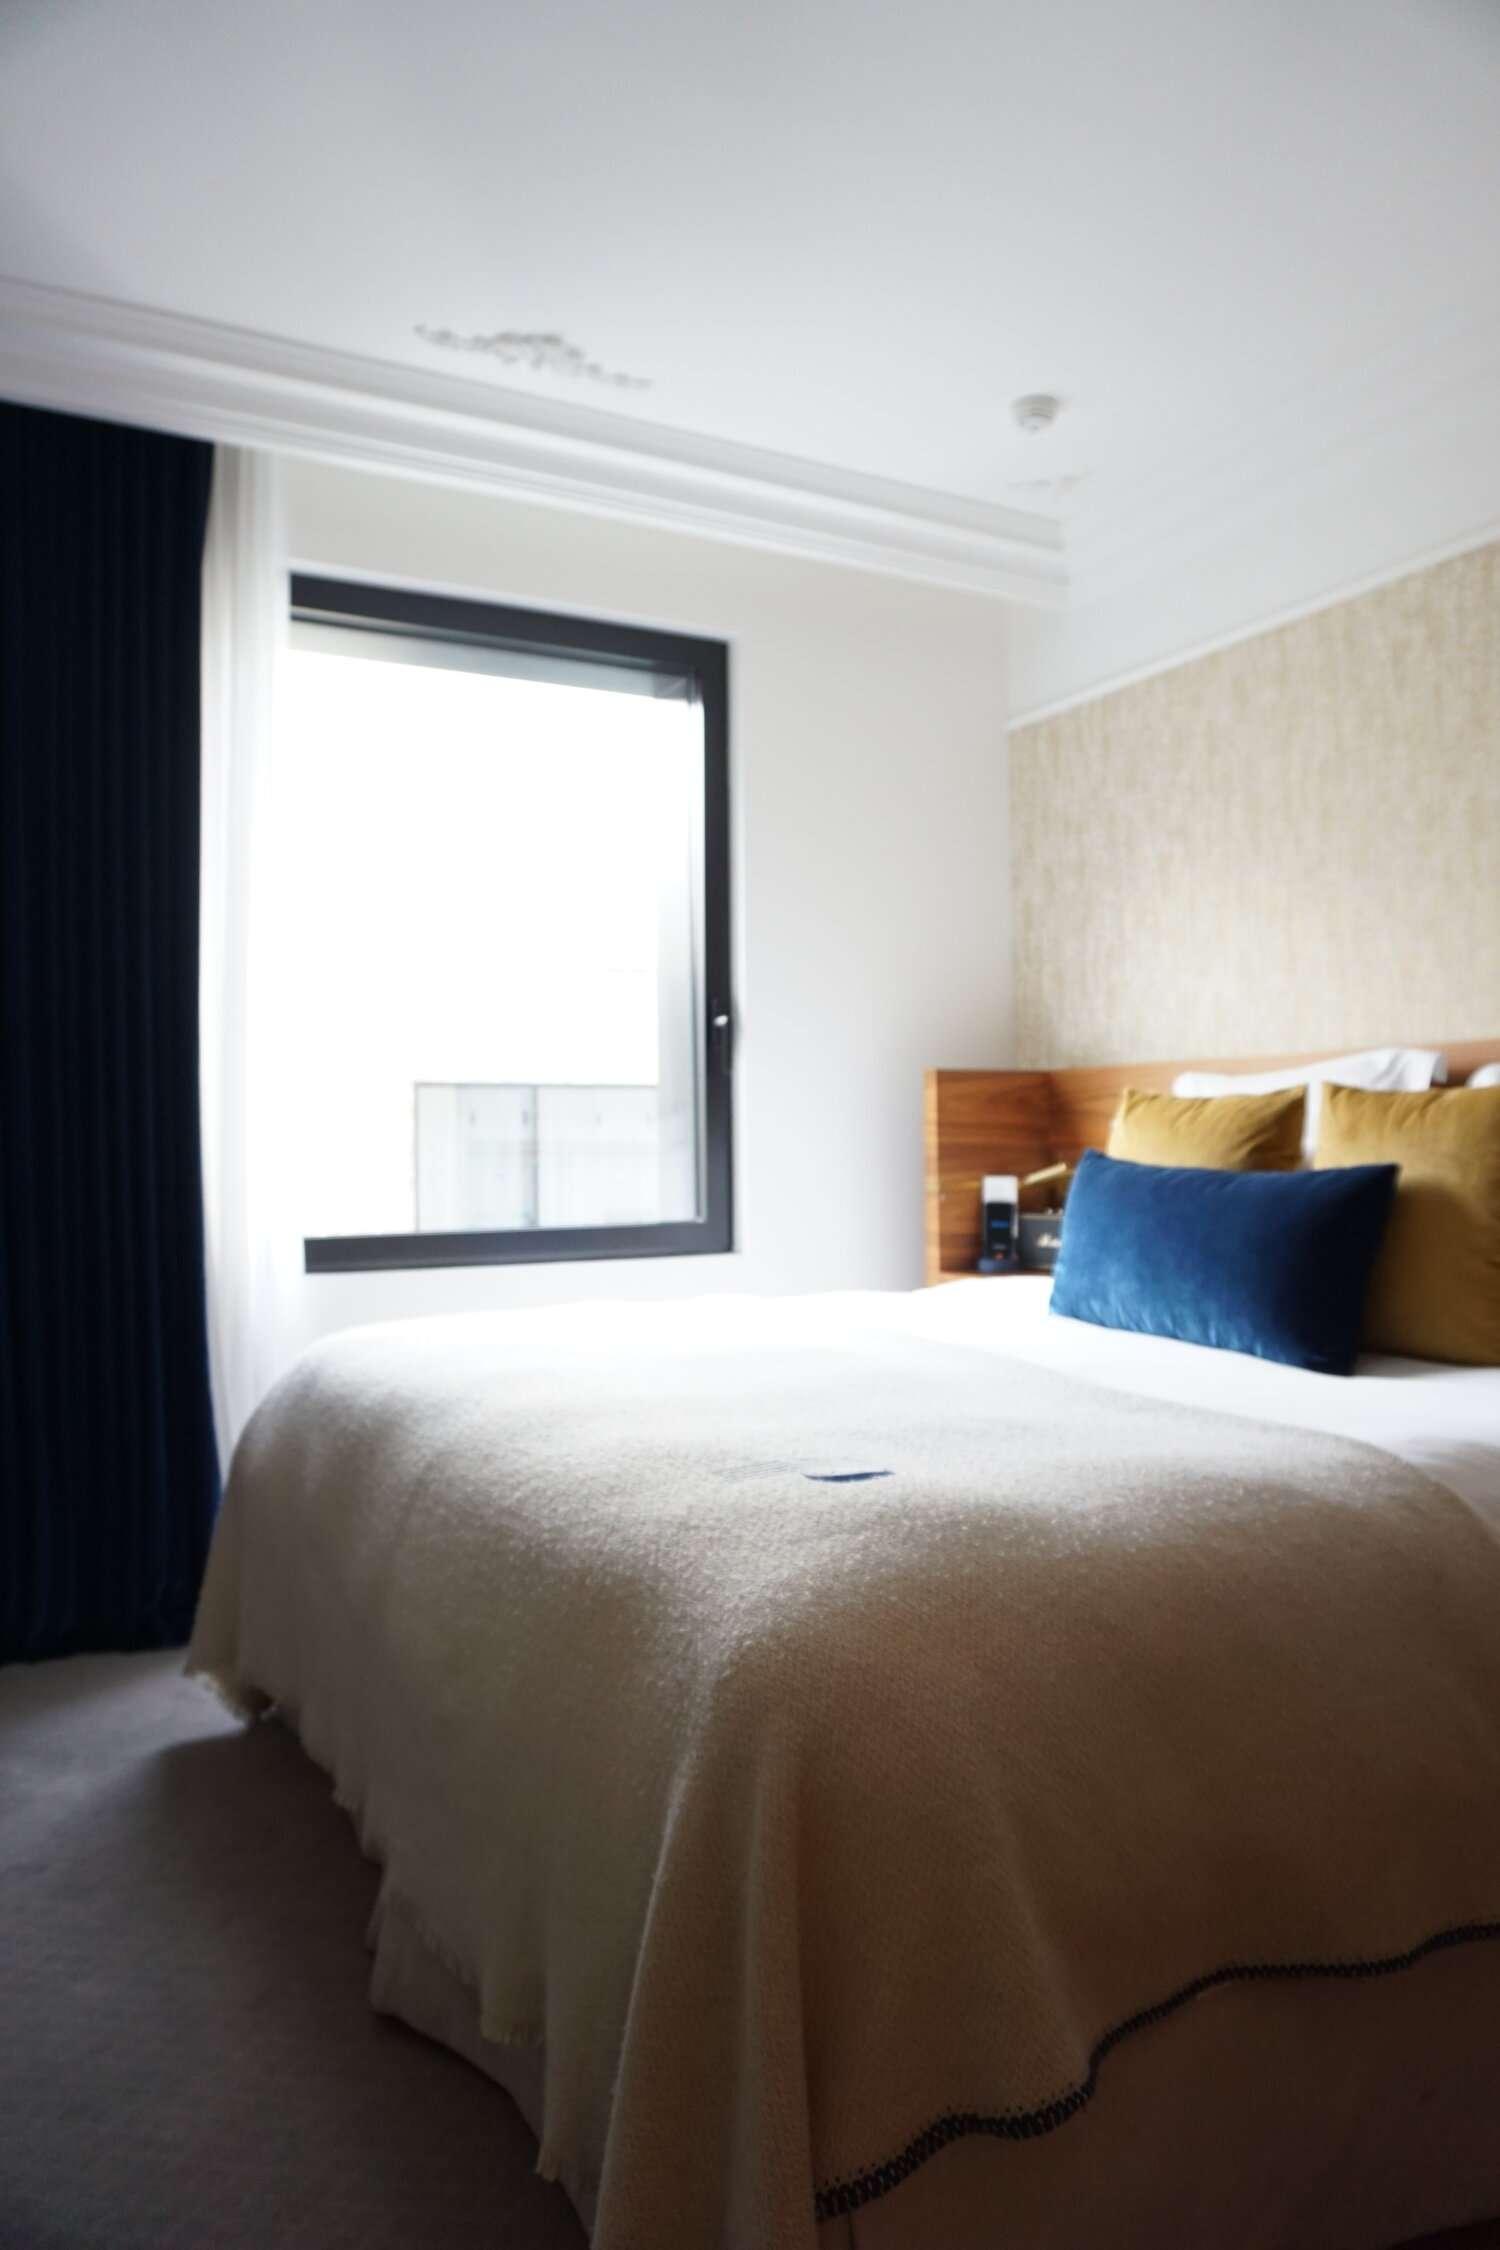 bedroom at Le Hotel Parister in Paris